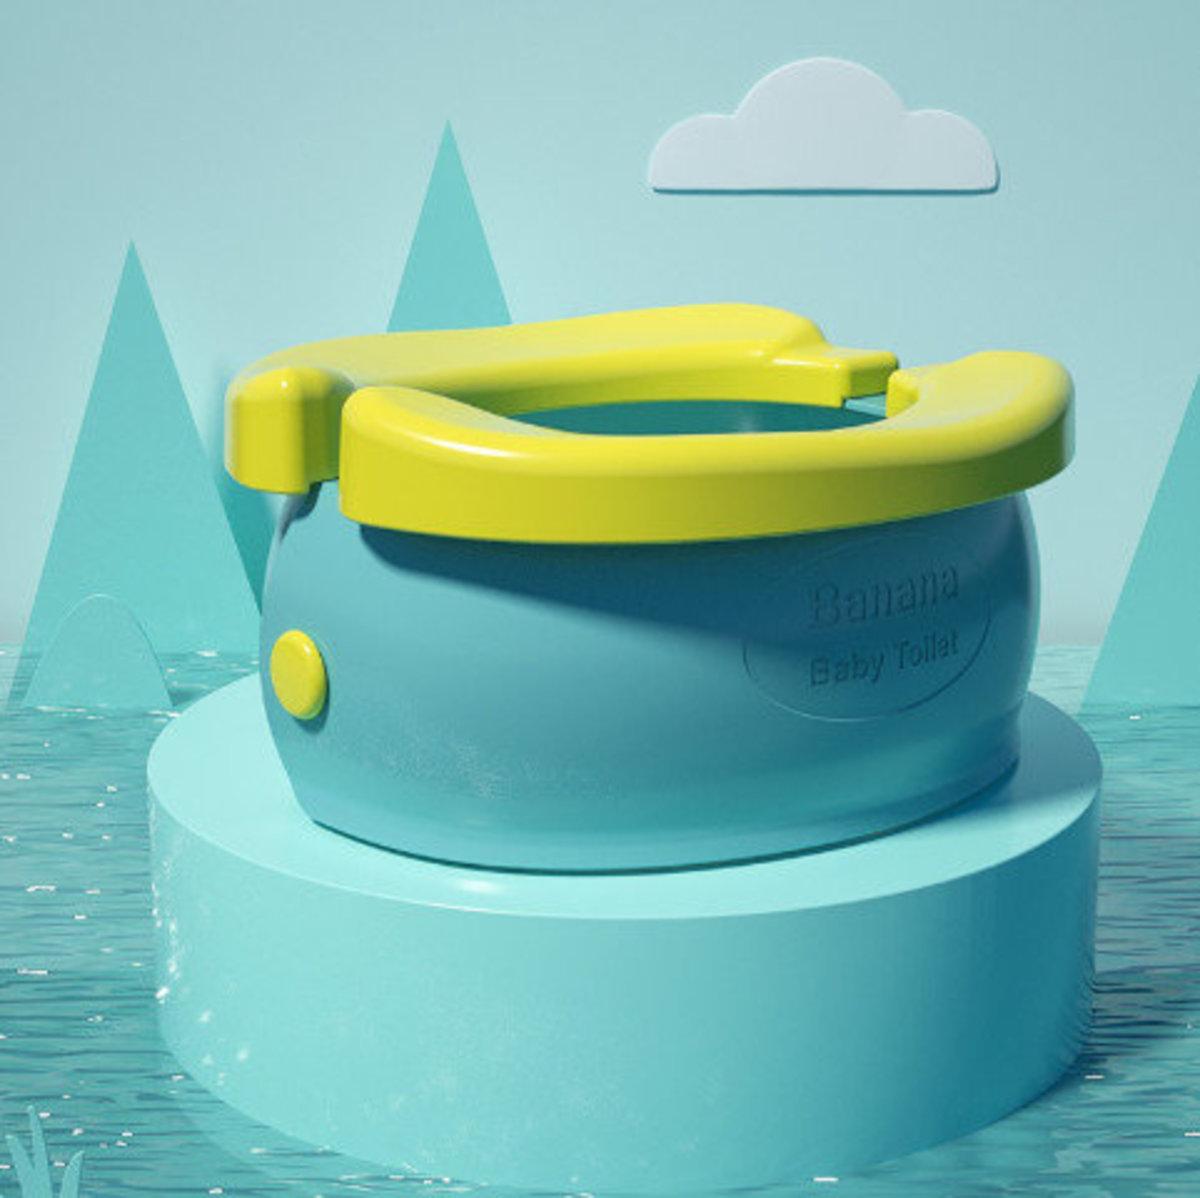 Baby Toilet-可折疊便攜兒童香蕉坐廁(綠色)